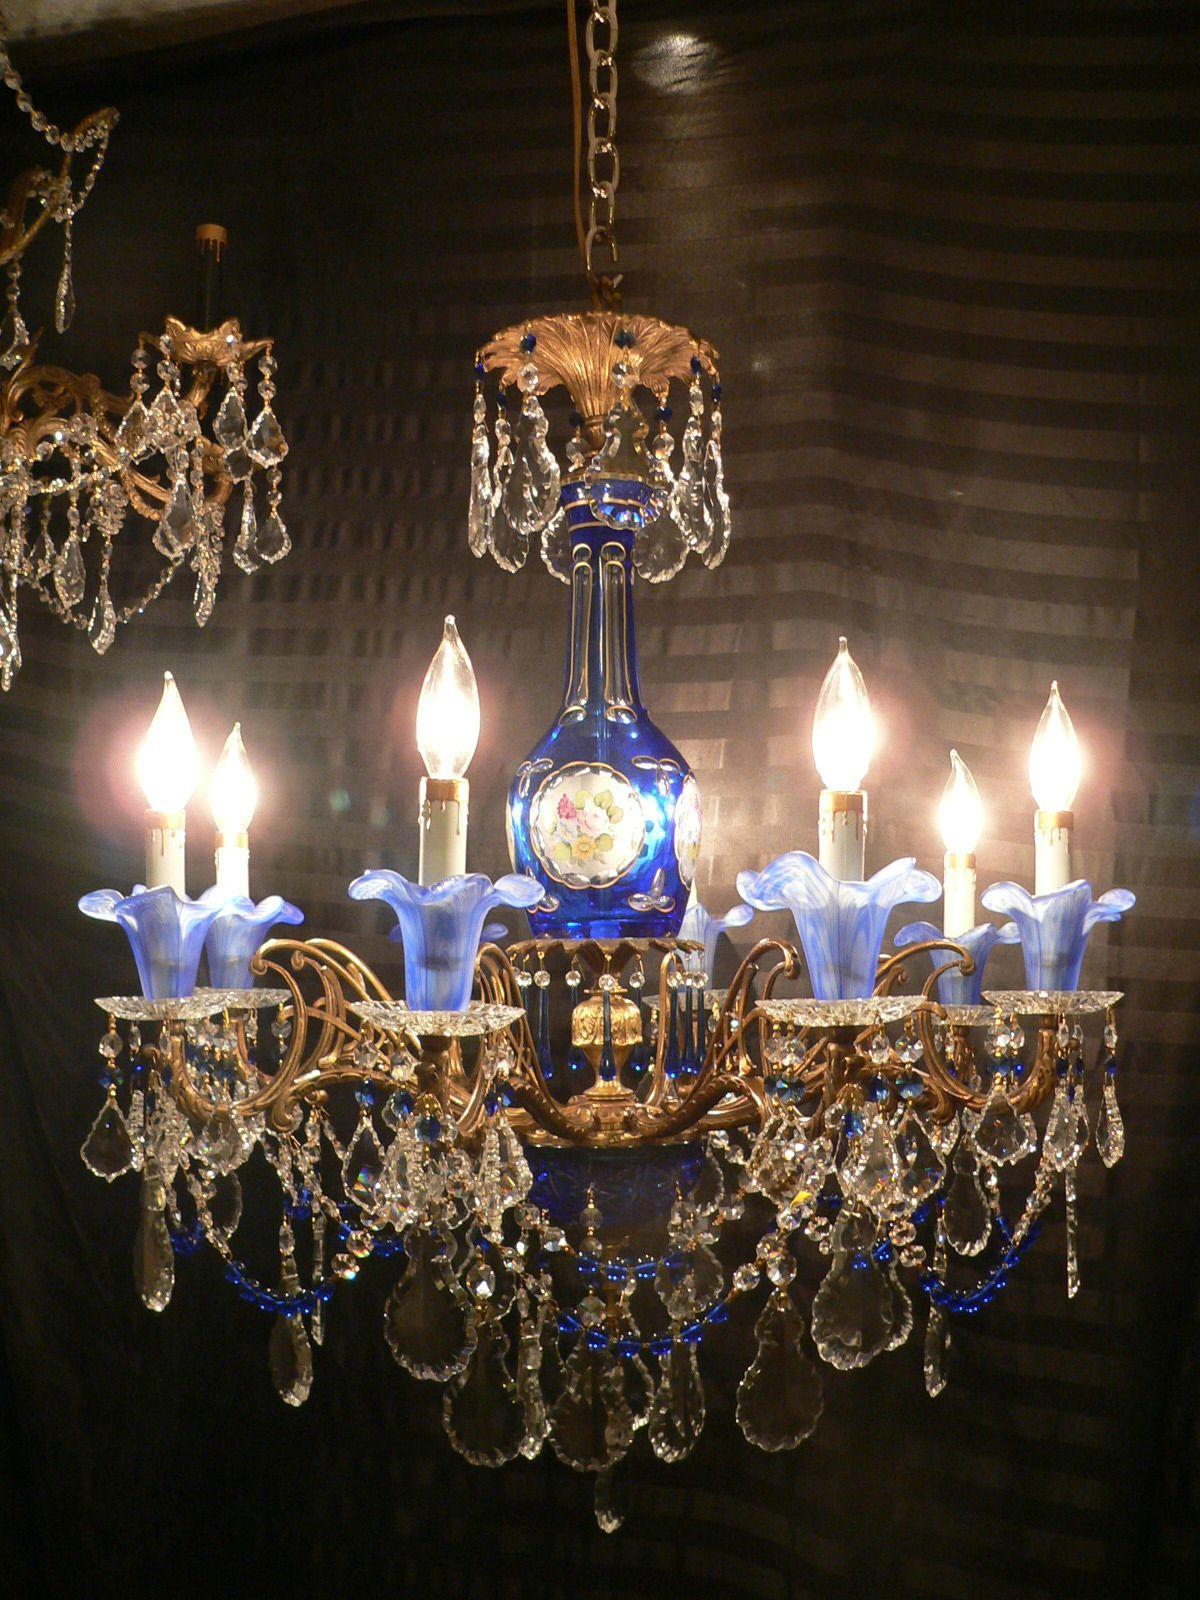 Vintage Brass Cobalt Blue Murano Tulip Bohemian Art Glass Chandelier - Chandelier crystals ebay